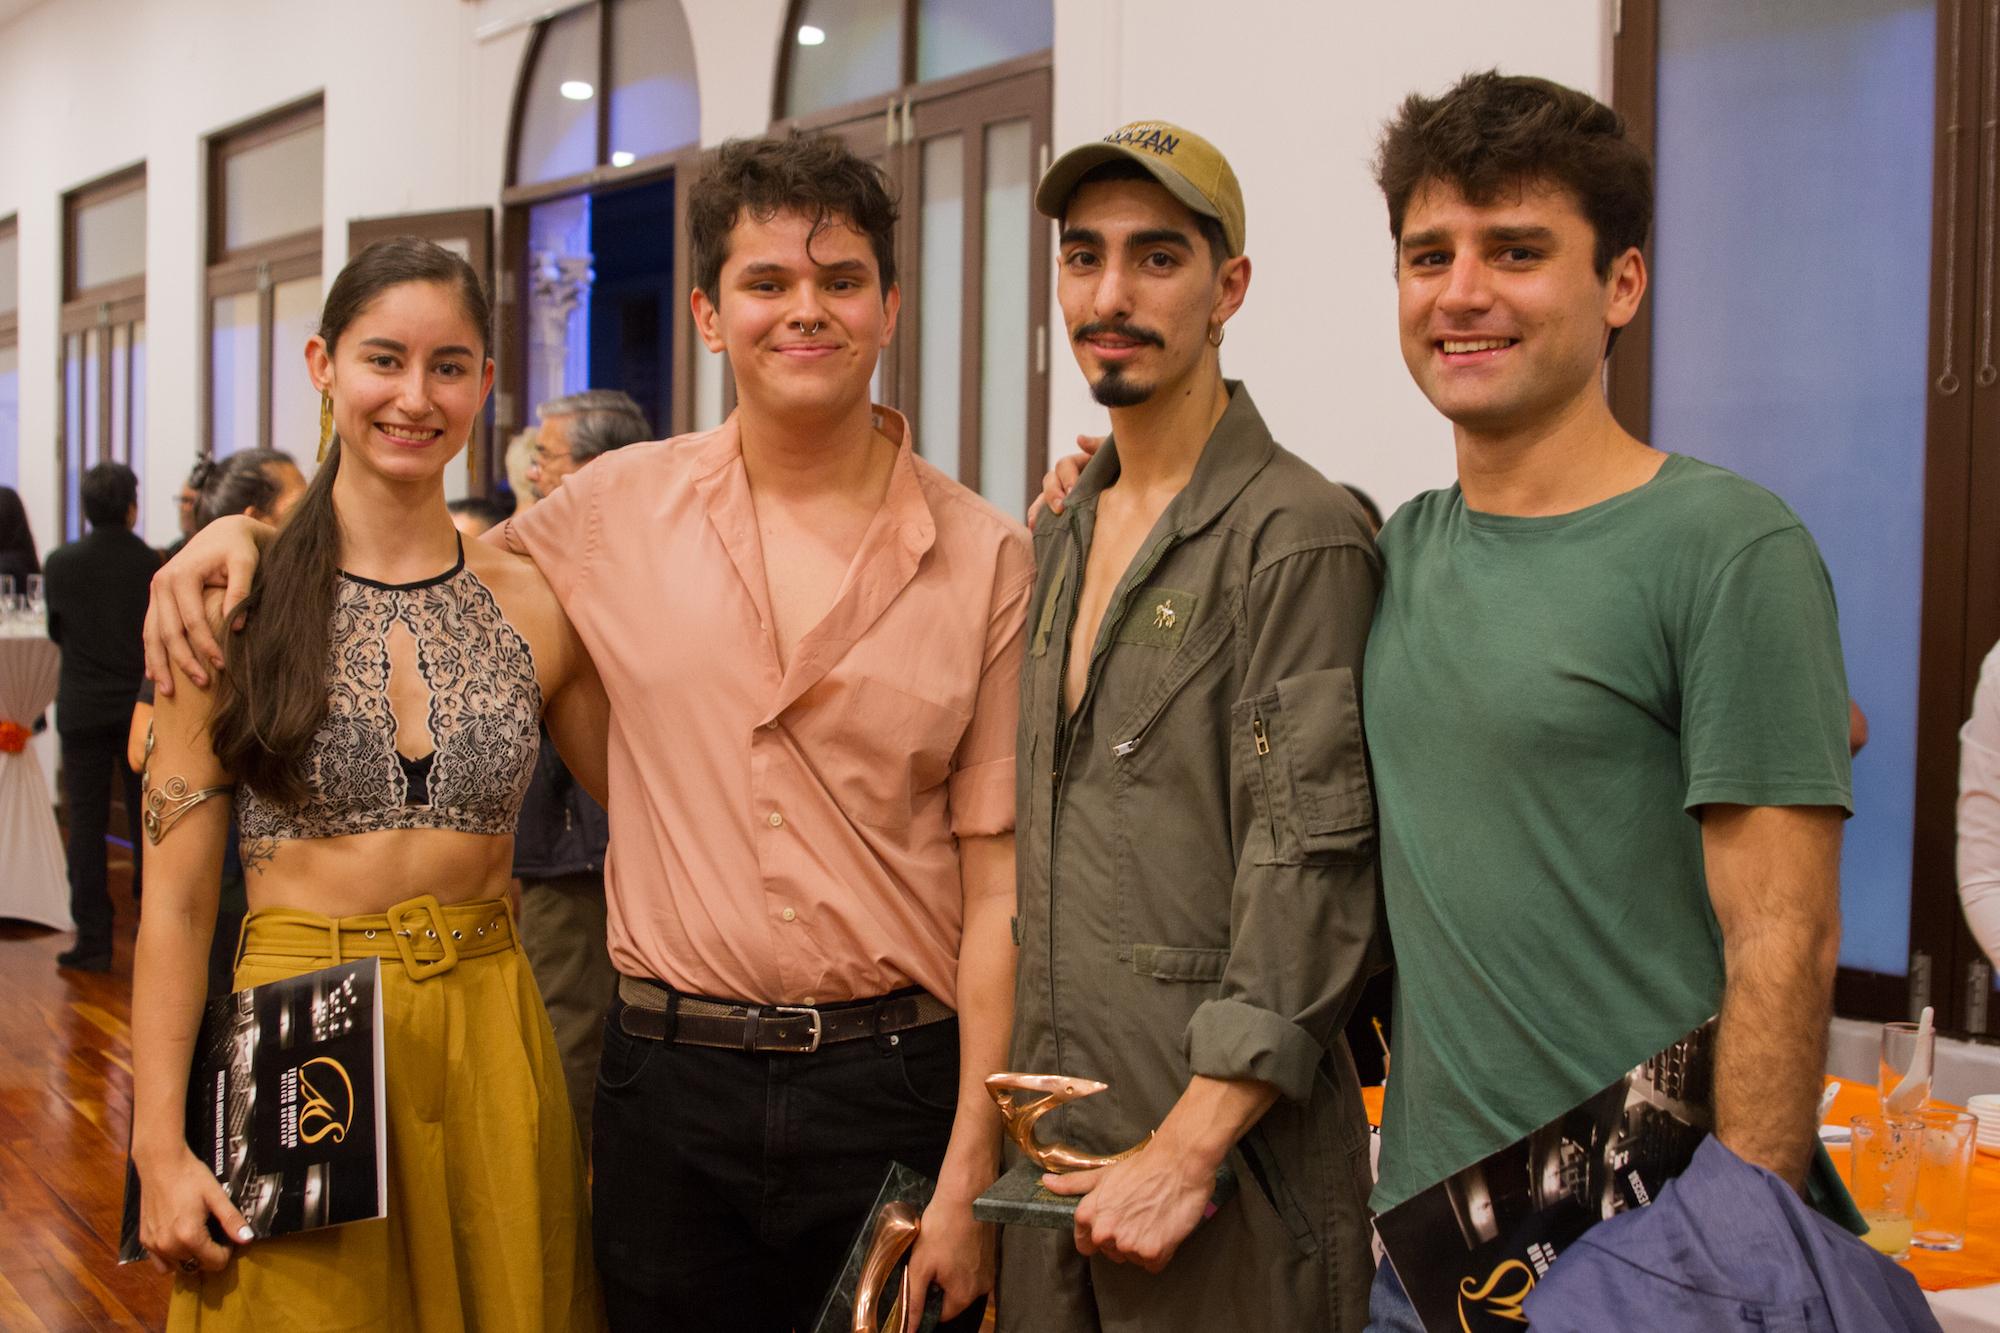 https://teatromelico.go.cr/images/FestNacDanza-8.11.19-AleH-0329.jpg